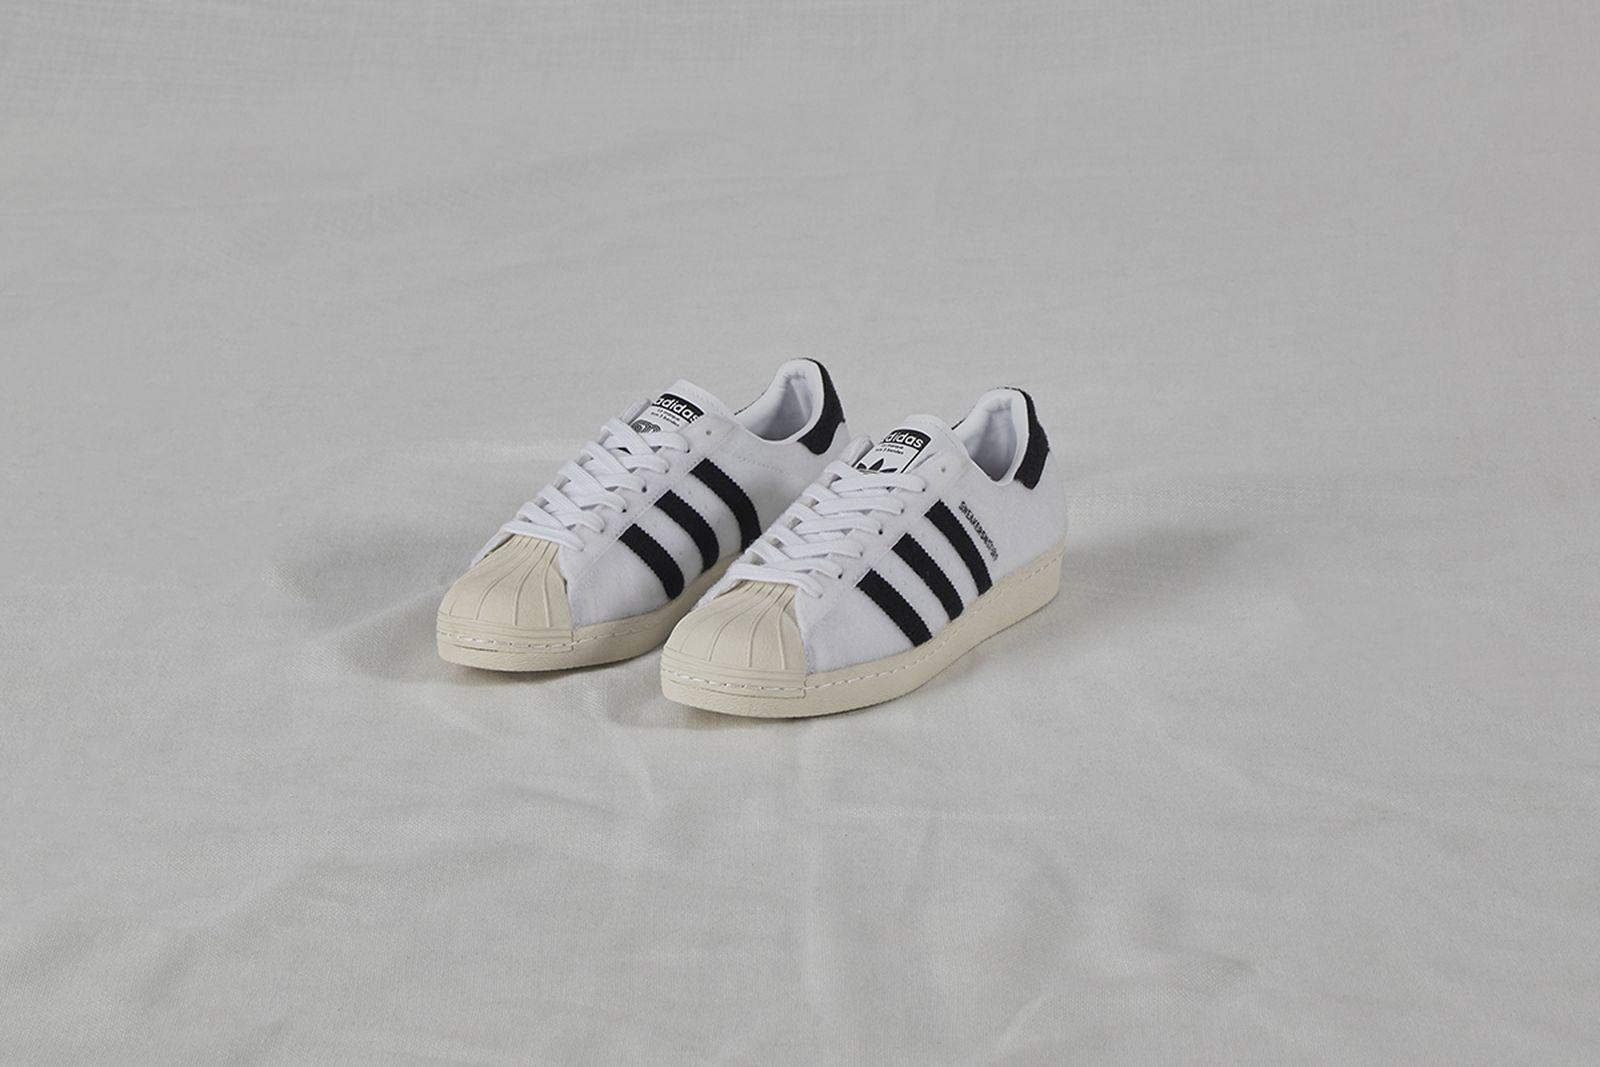 sns-kazuki-kuraishi-adidas-superstar-release-date-price-09